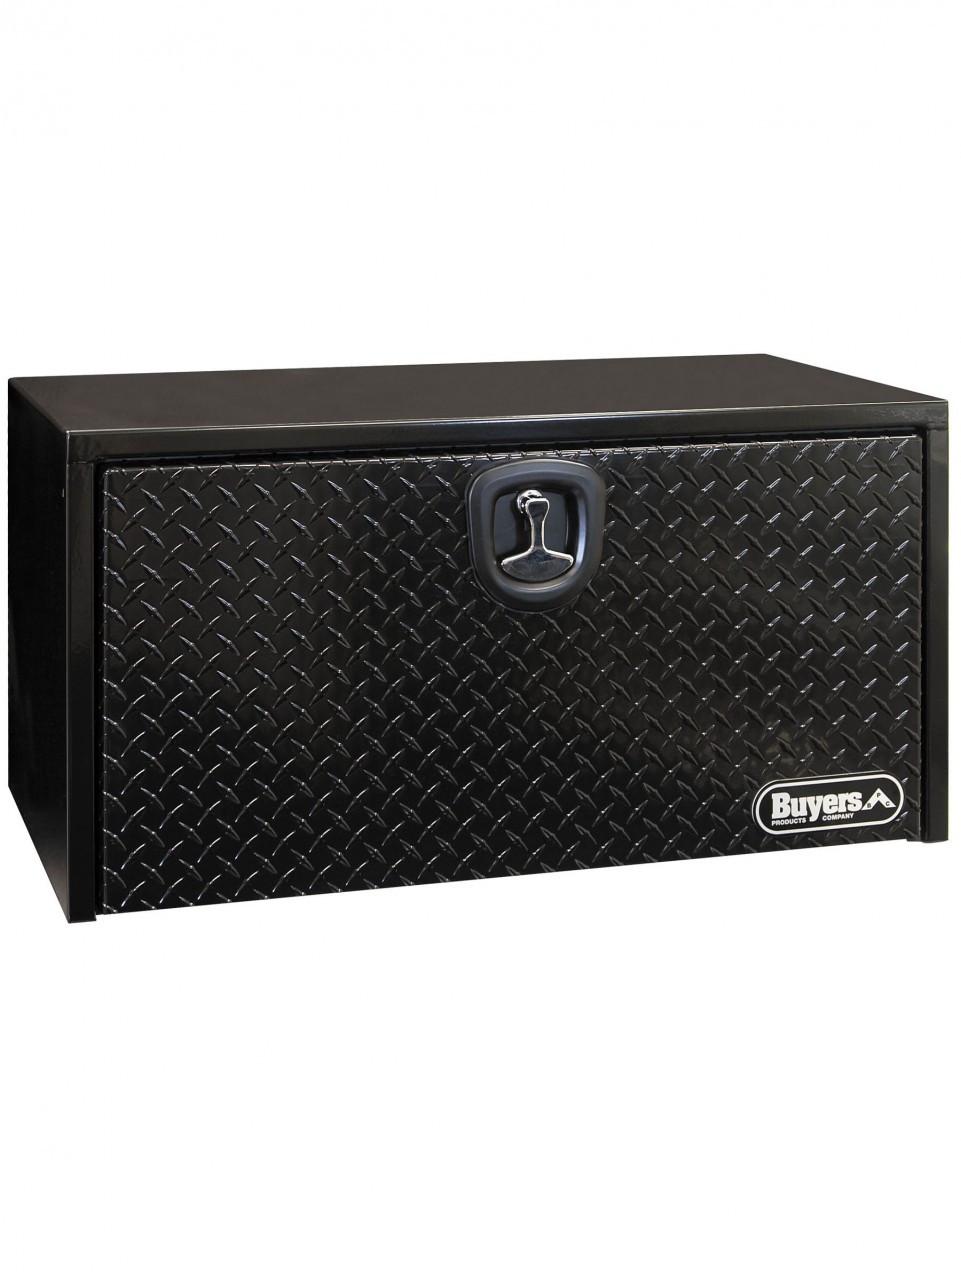 "UTBS24-BTP --- Underbody Tool Box w/Diamond Tread Door -  Steel 18""x18""x24"""